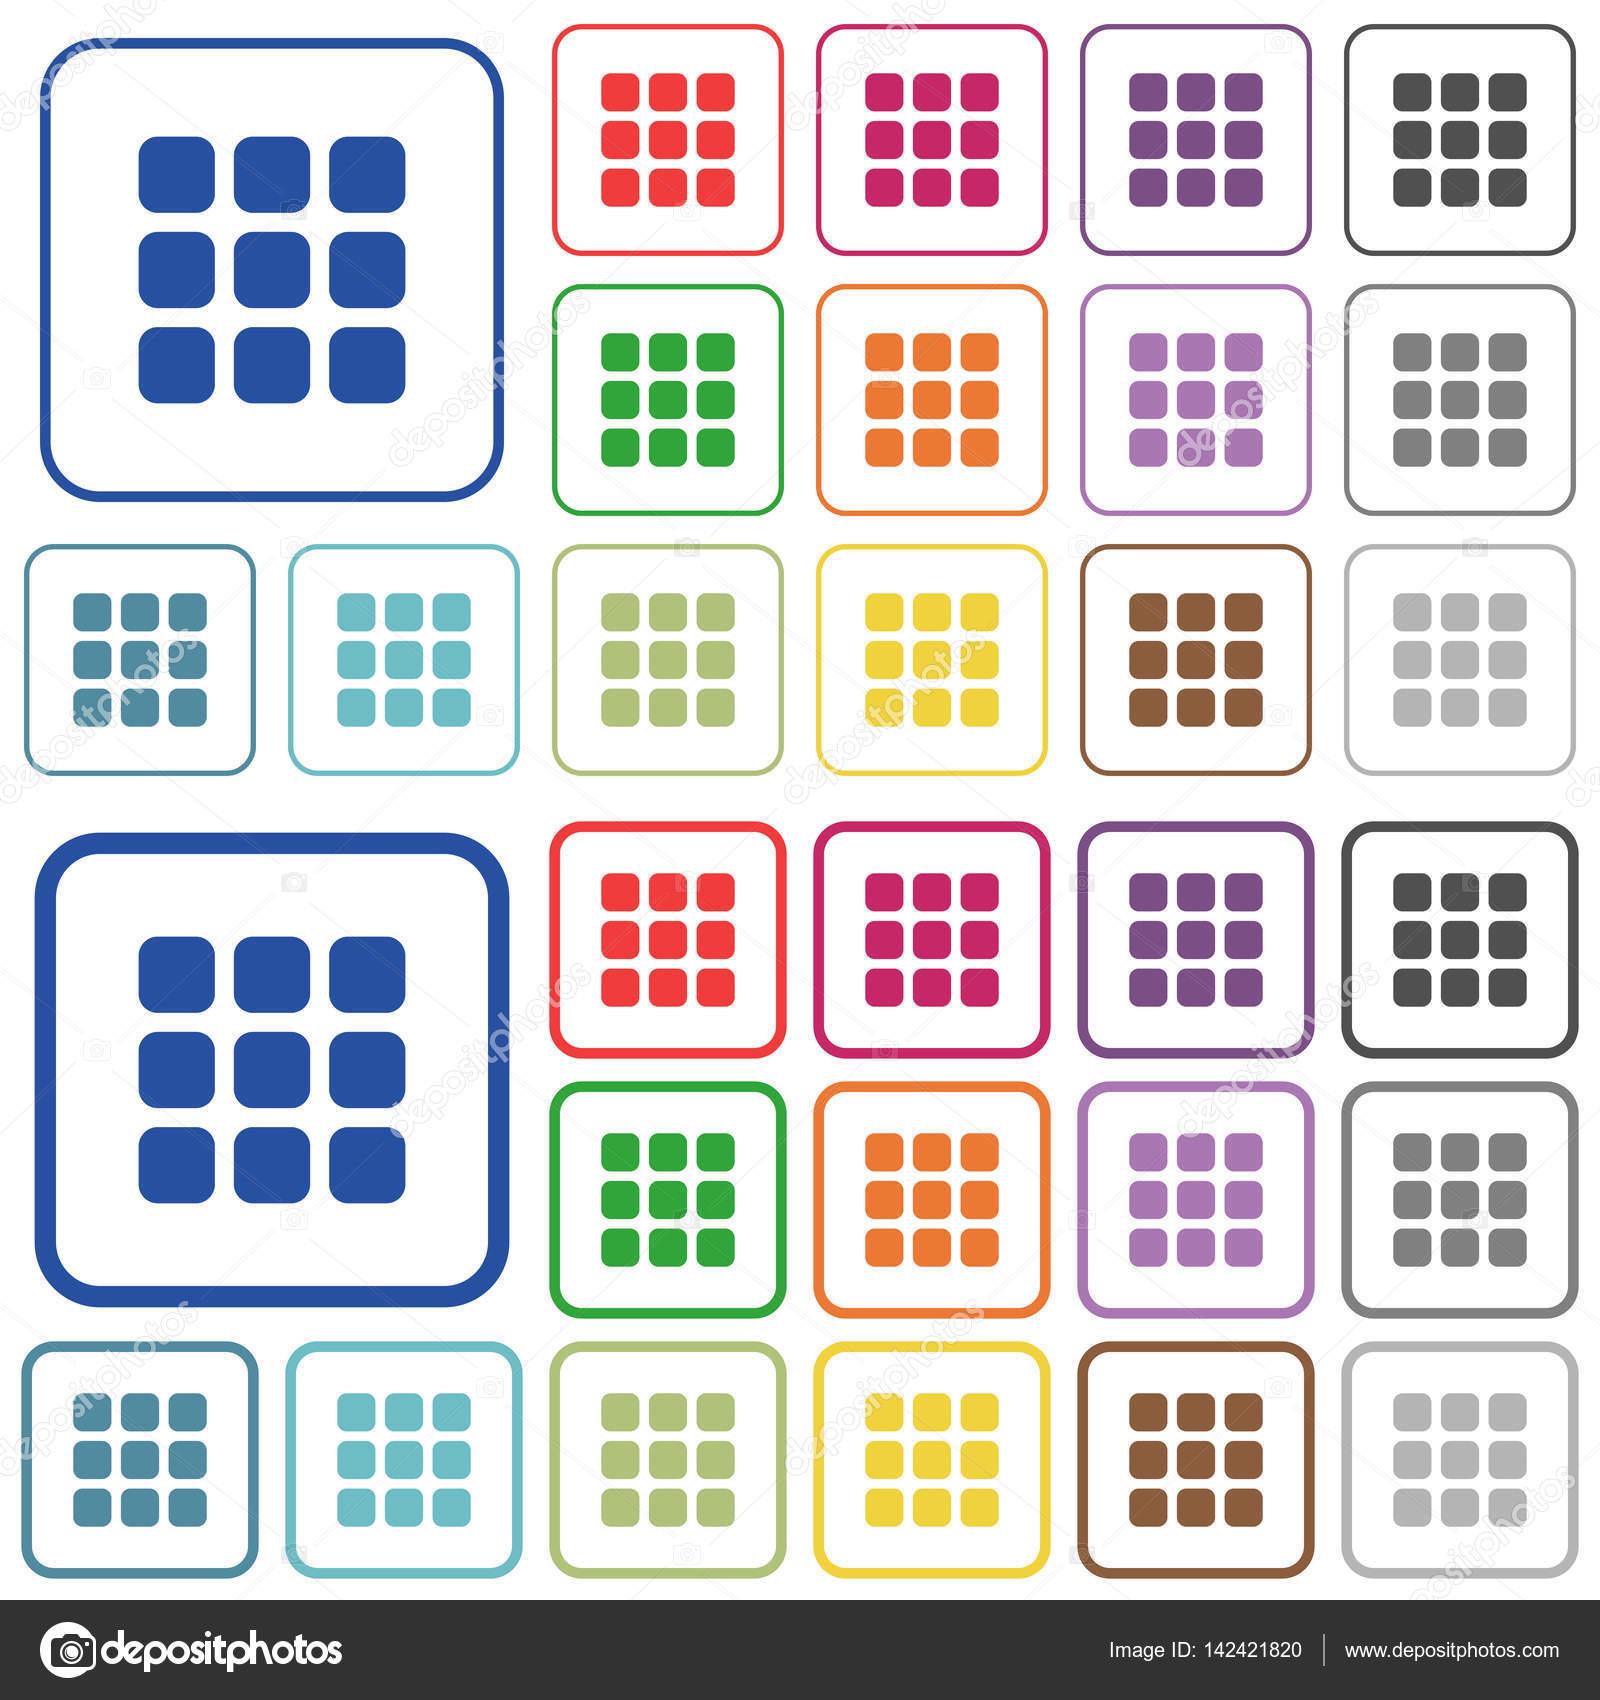 Kleinen thumbnail-Ansicht-Modus beschrieben flache farbige icons ...